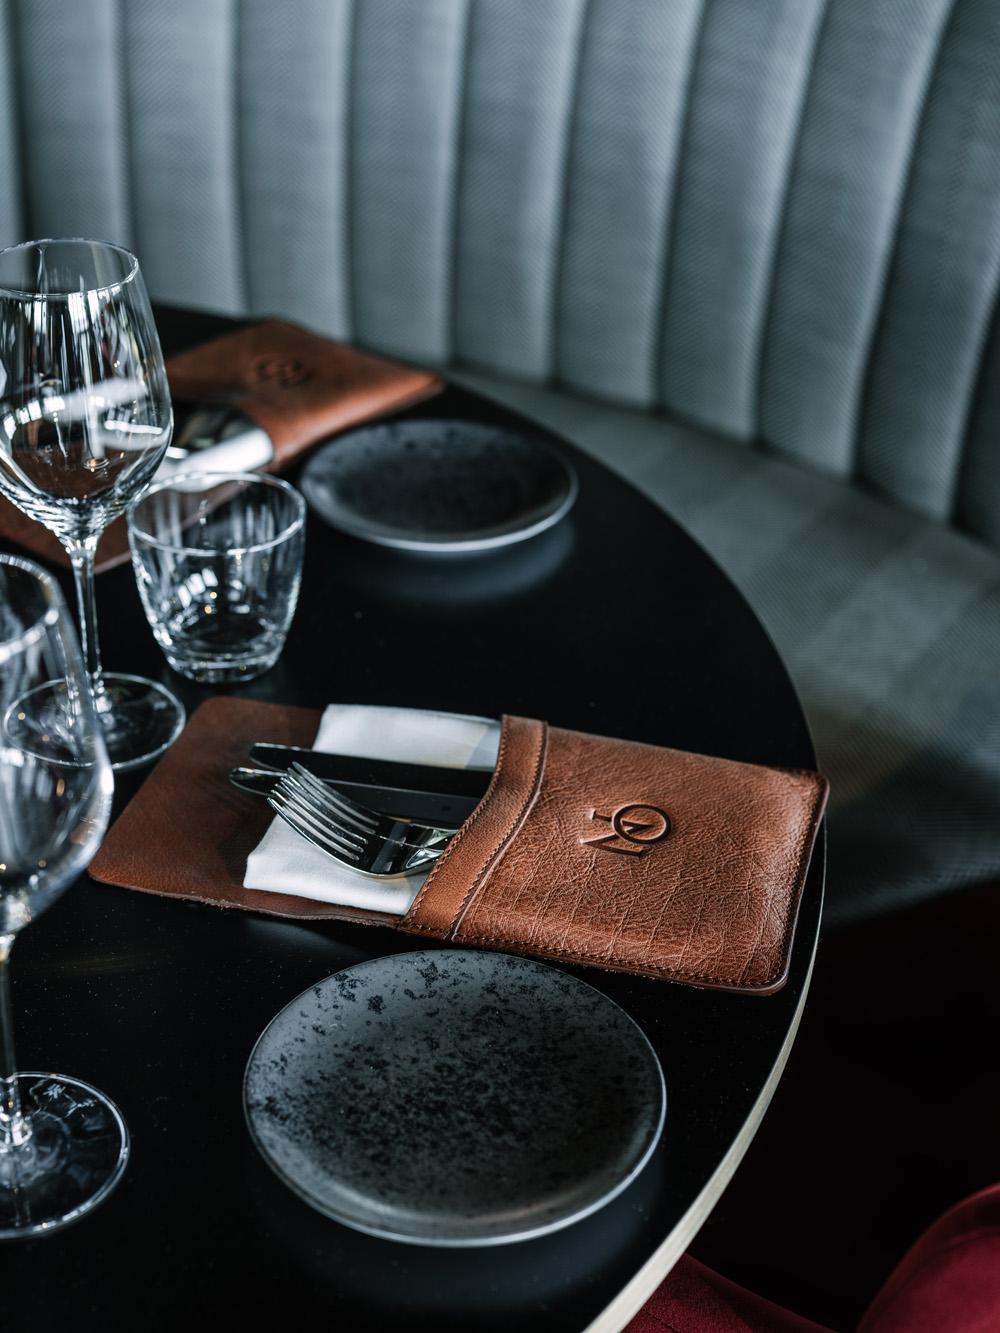 Norda restaurant fotograf interior oslo The Hub fotograf Mats Dreyer vintage